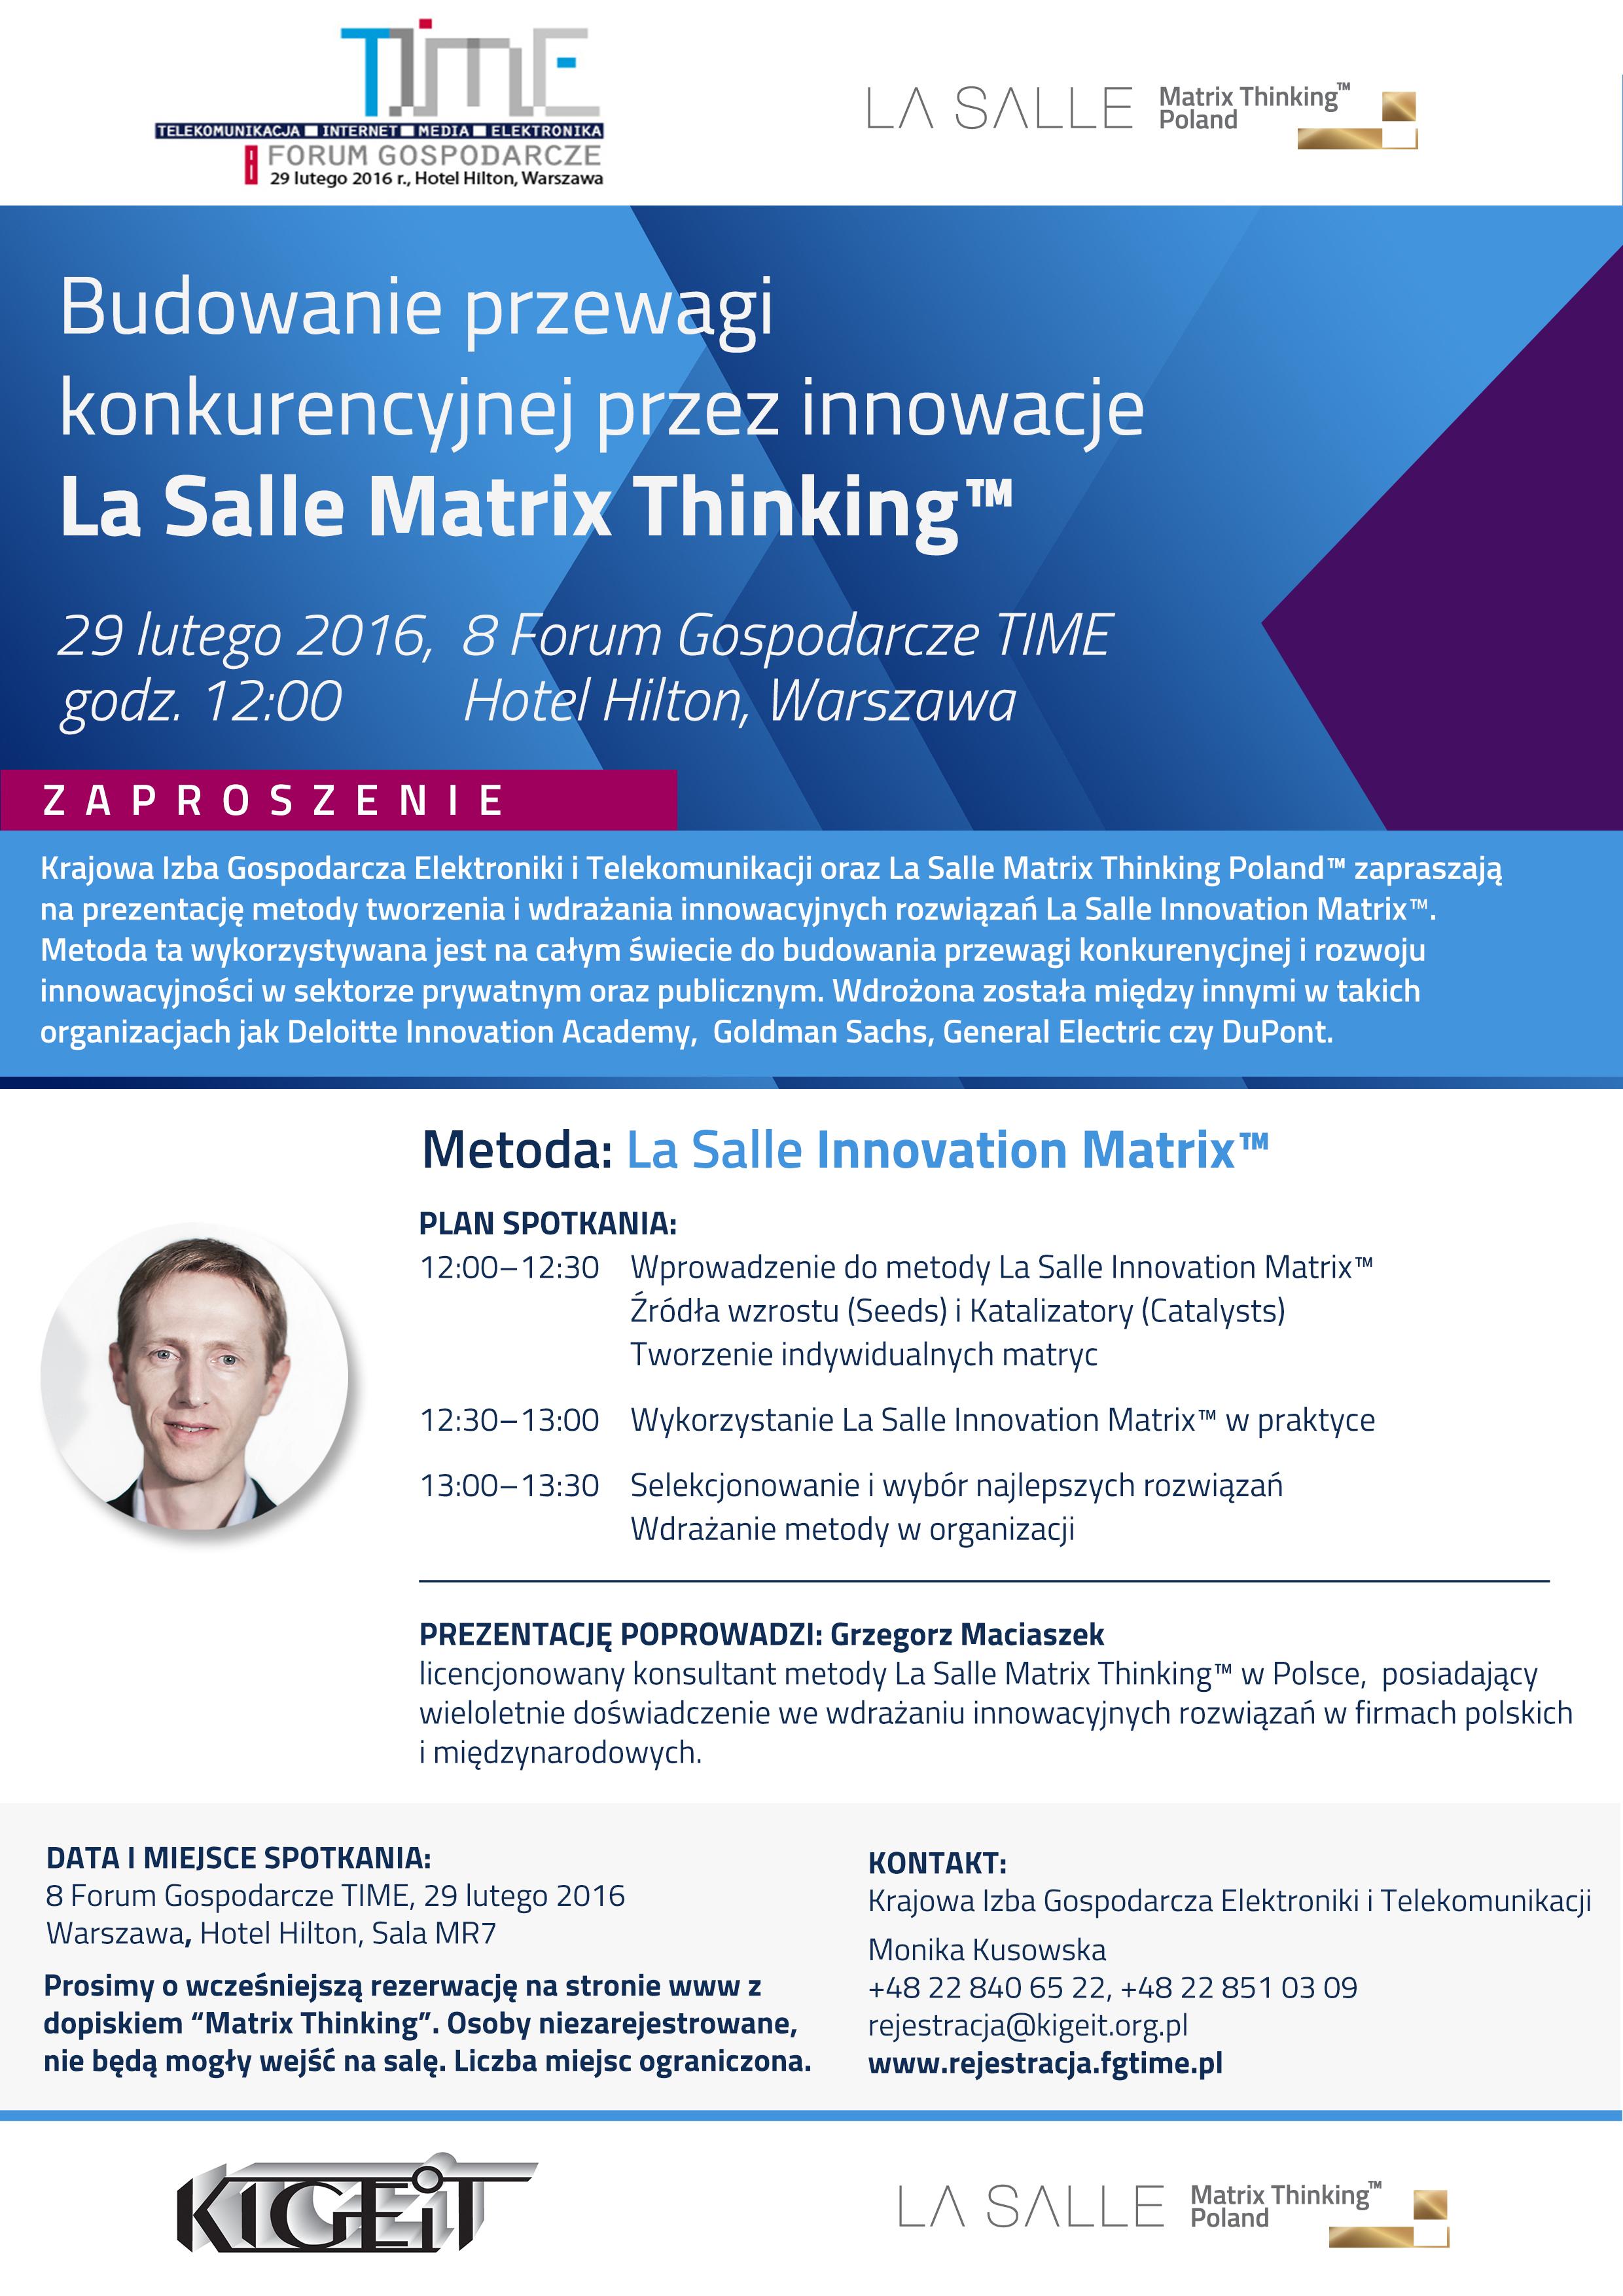 Forum Gospodarcze TIME. Zaproszenie La Salle Matrix Thinking